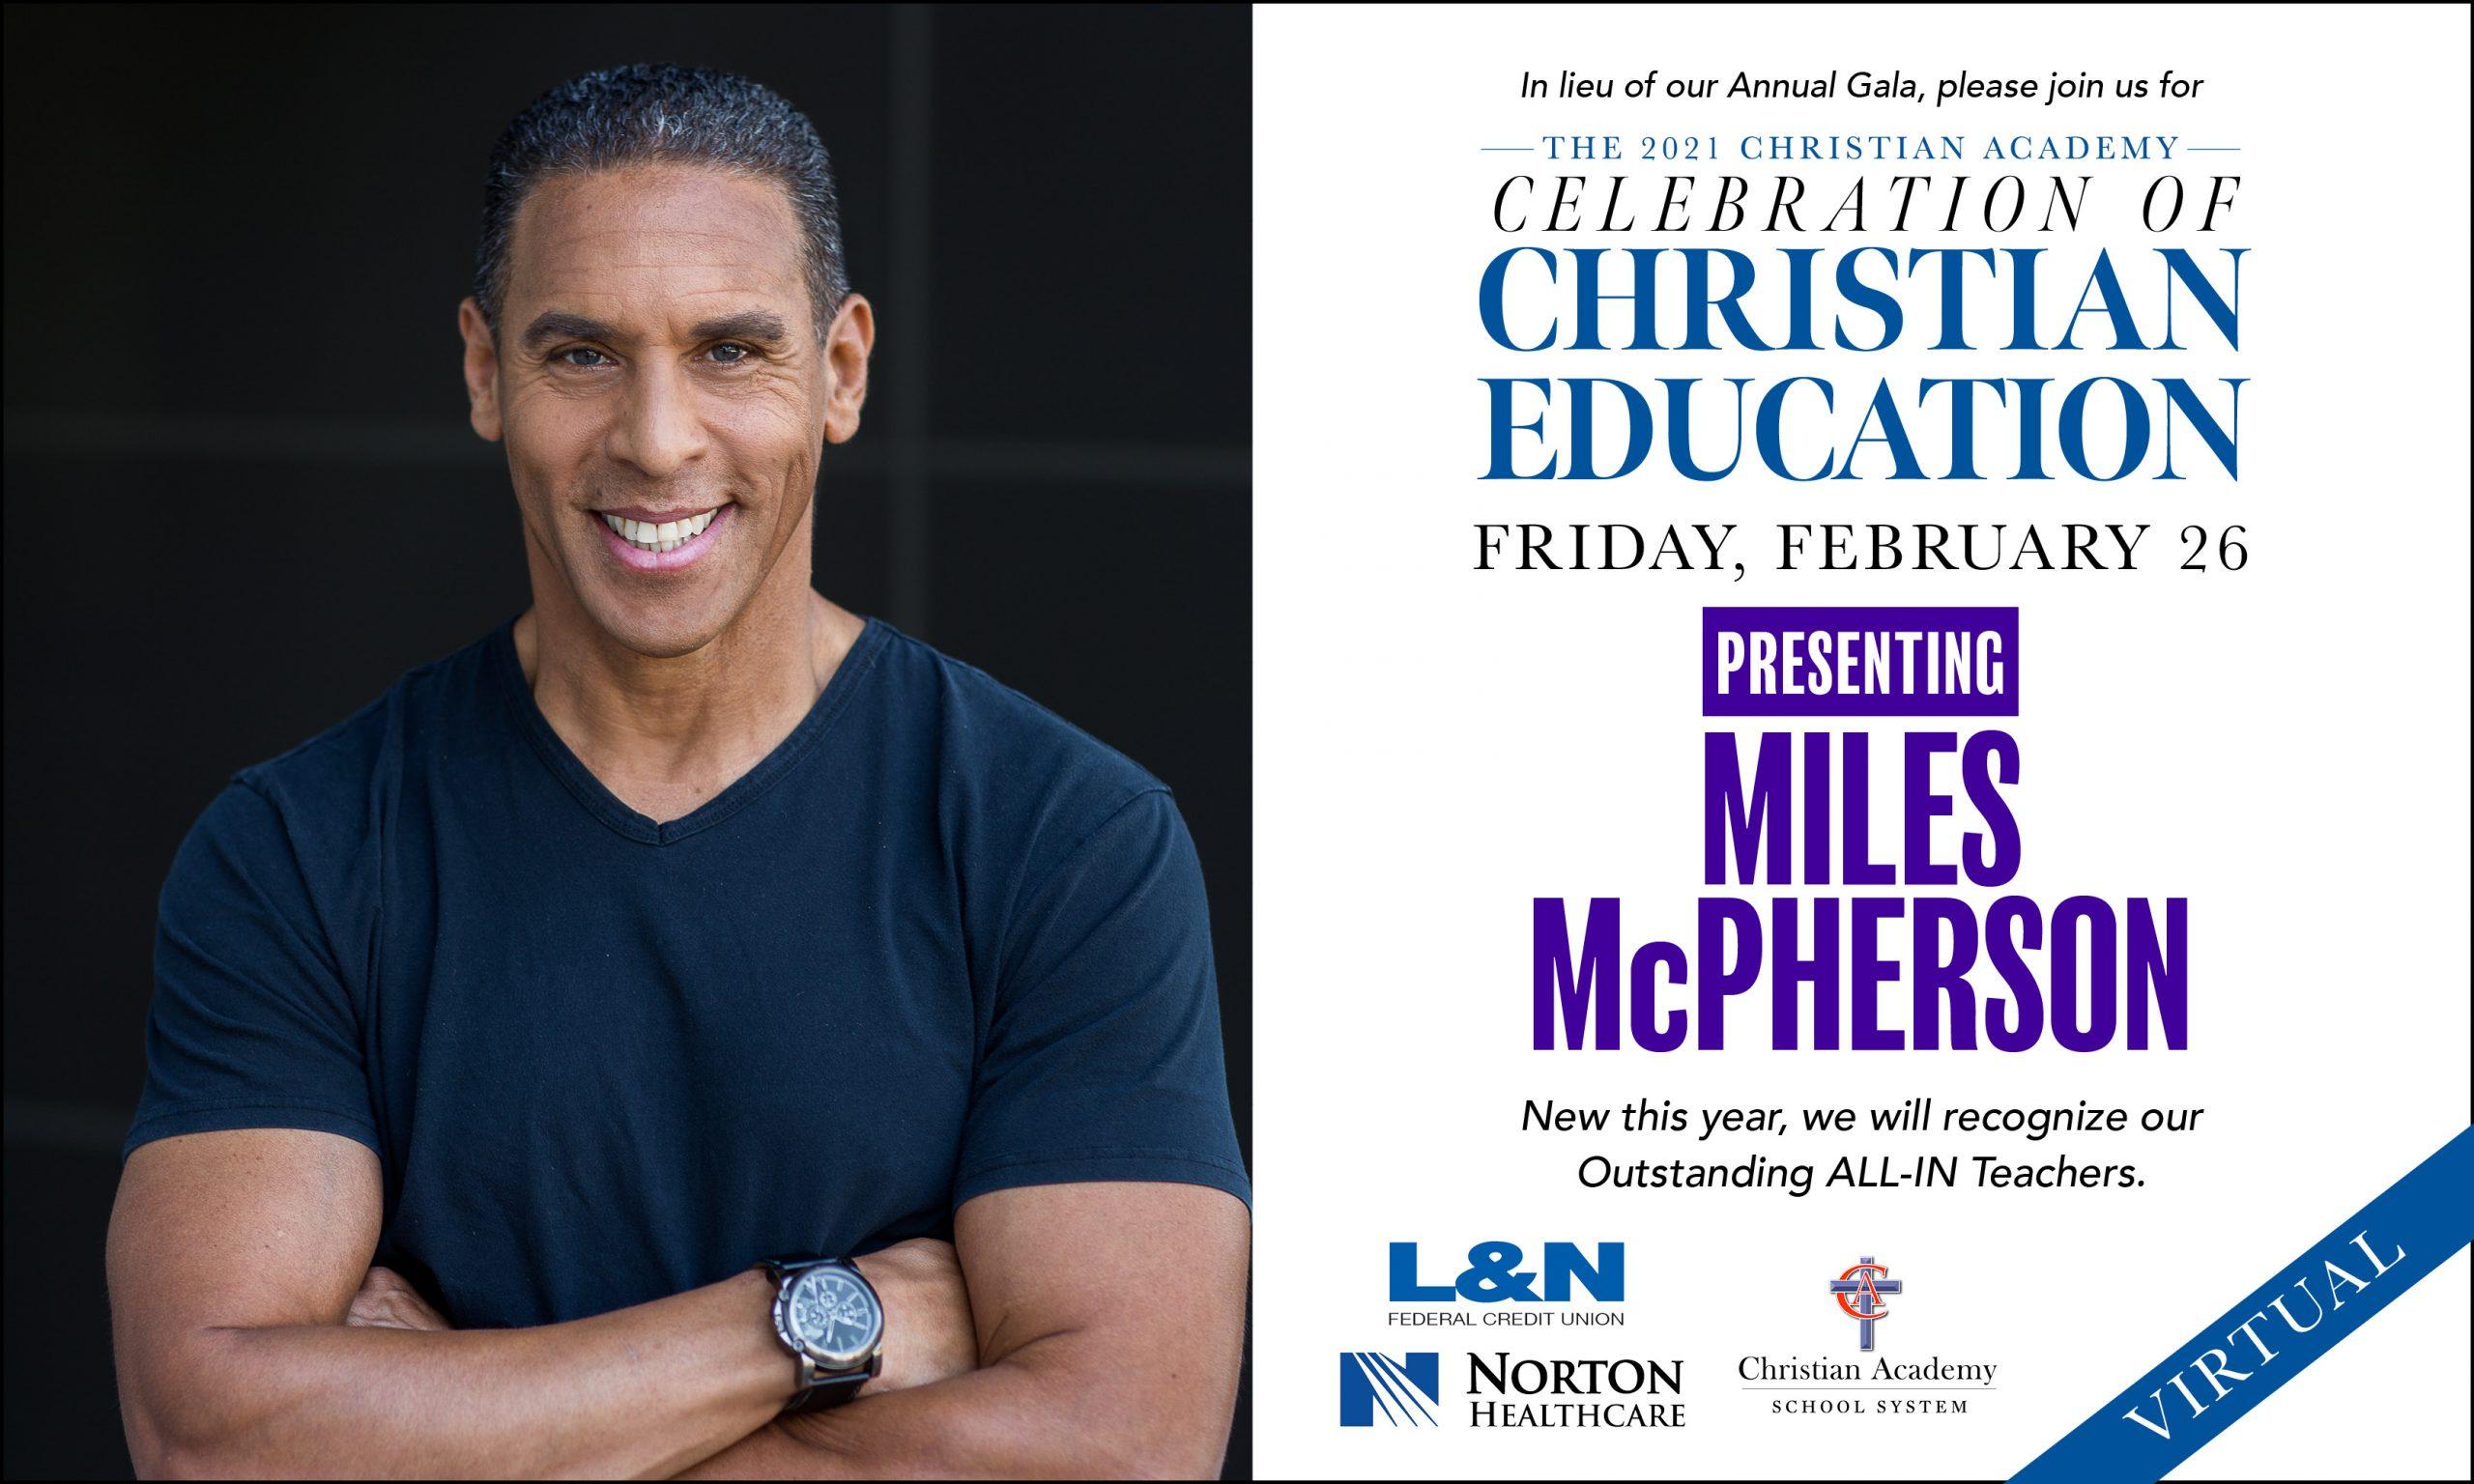 Christian Academy School System | 2021 Christian Academy Celebration of Christian Education | Mile McPherson | February 26